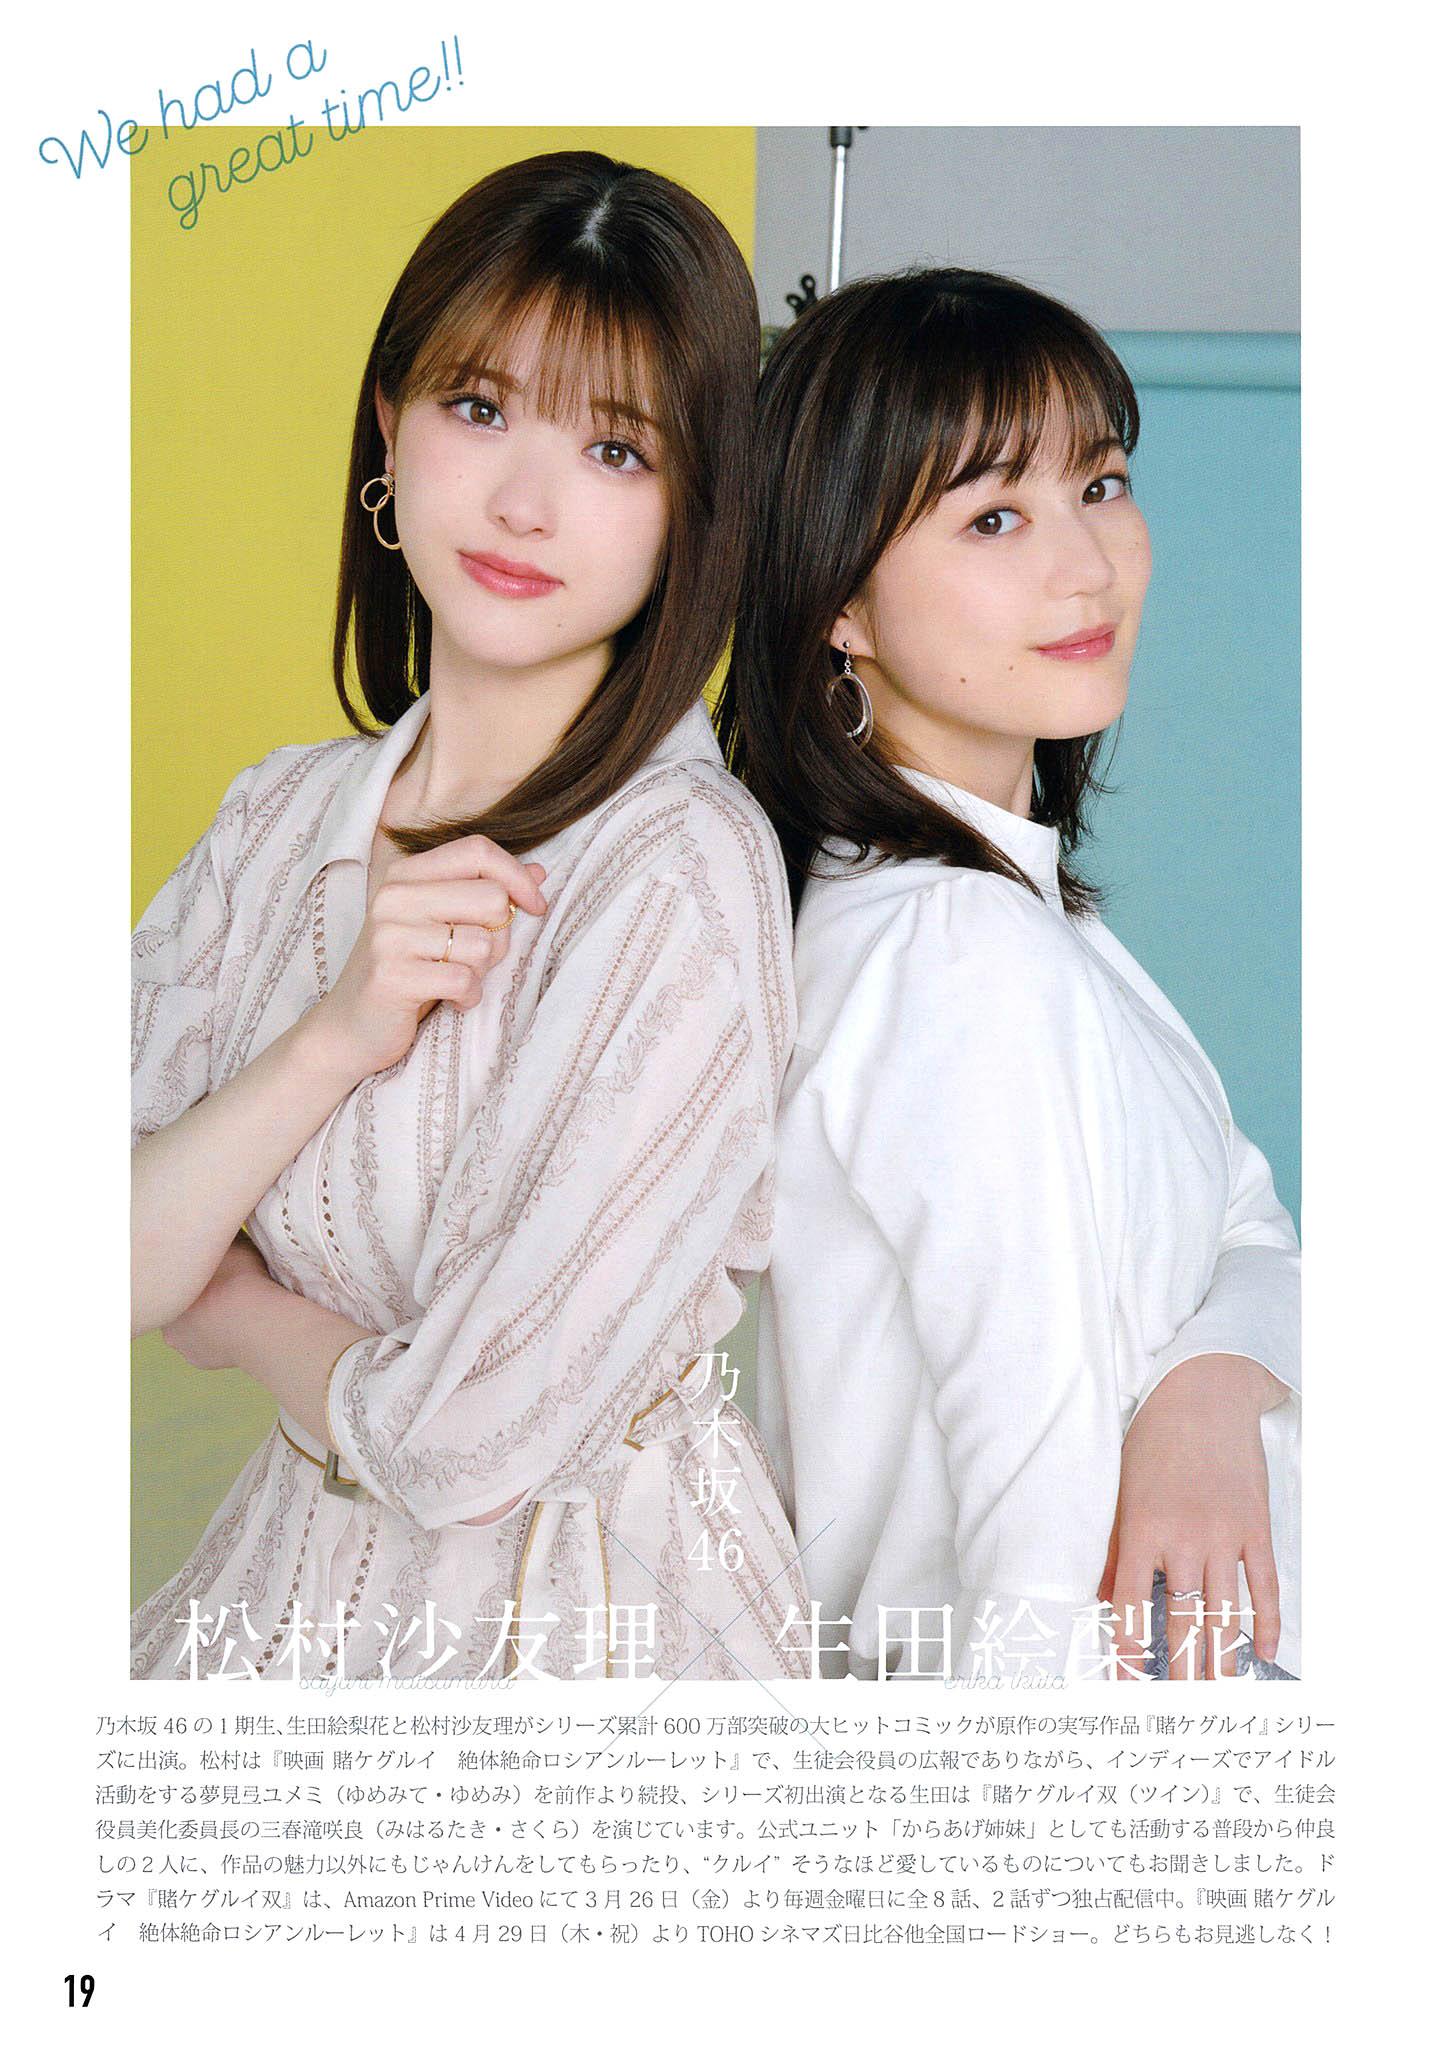 EIkuta SMatsumura Big One Girls 2105 01.jpg